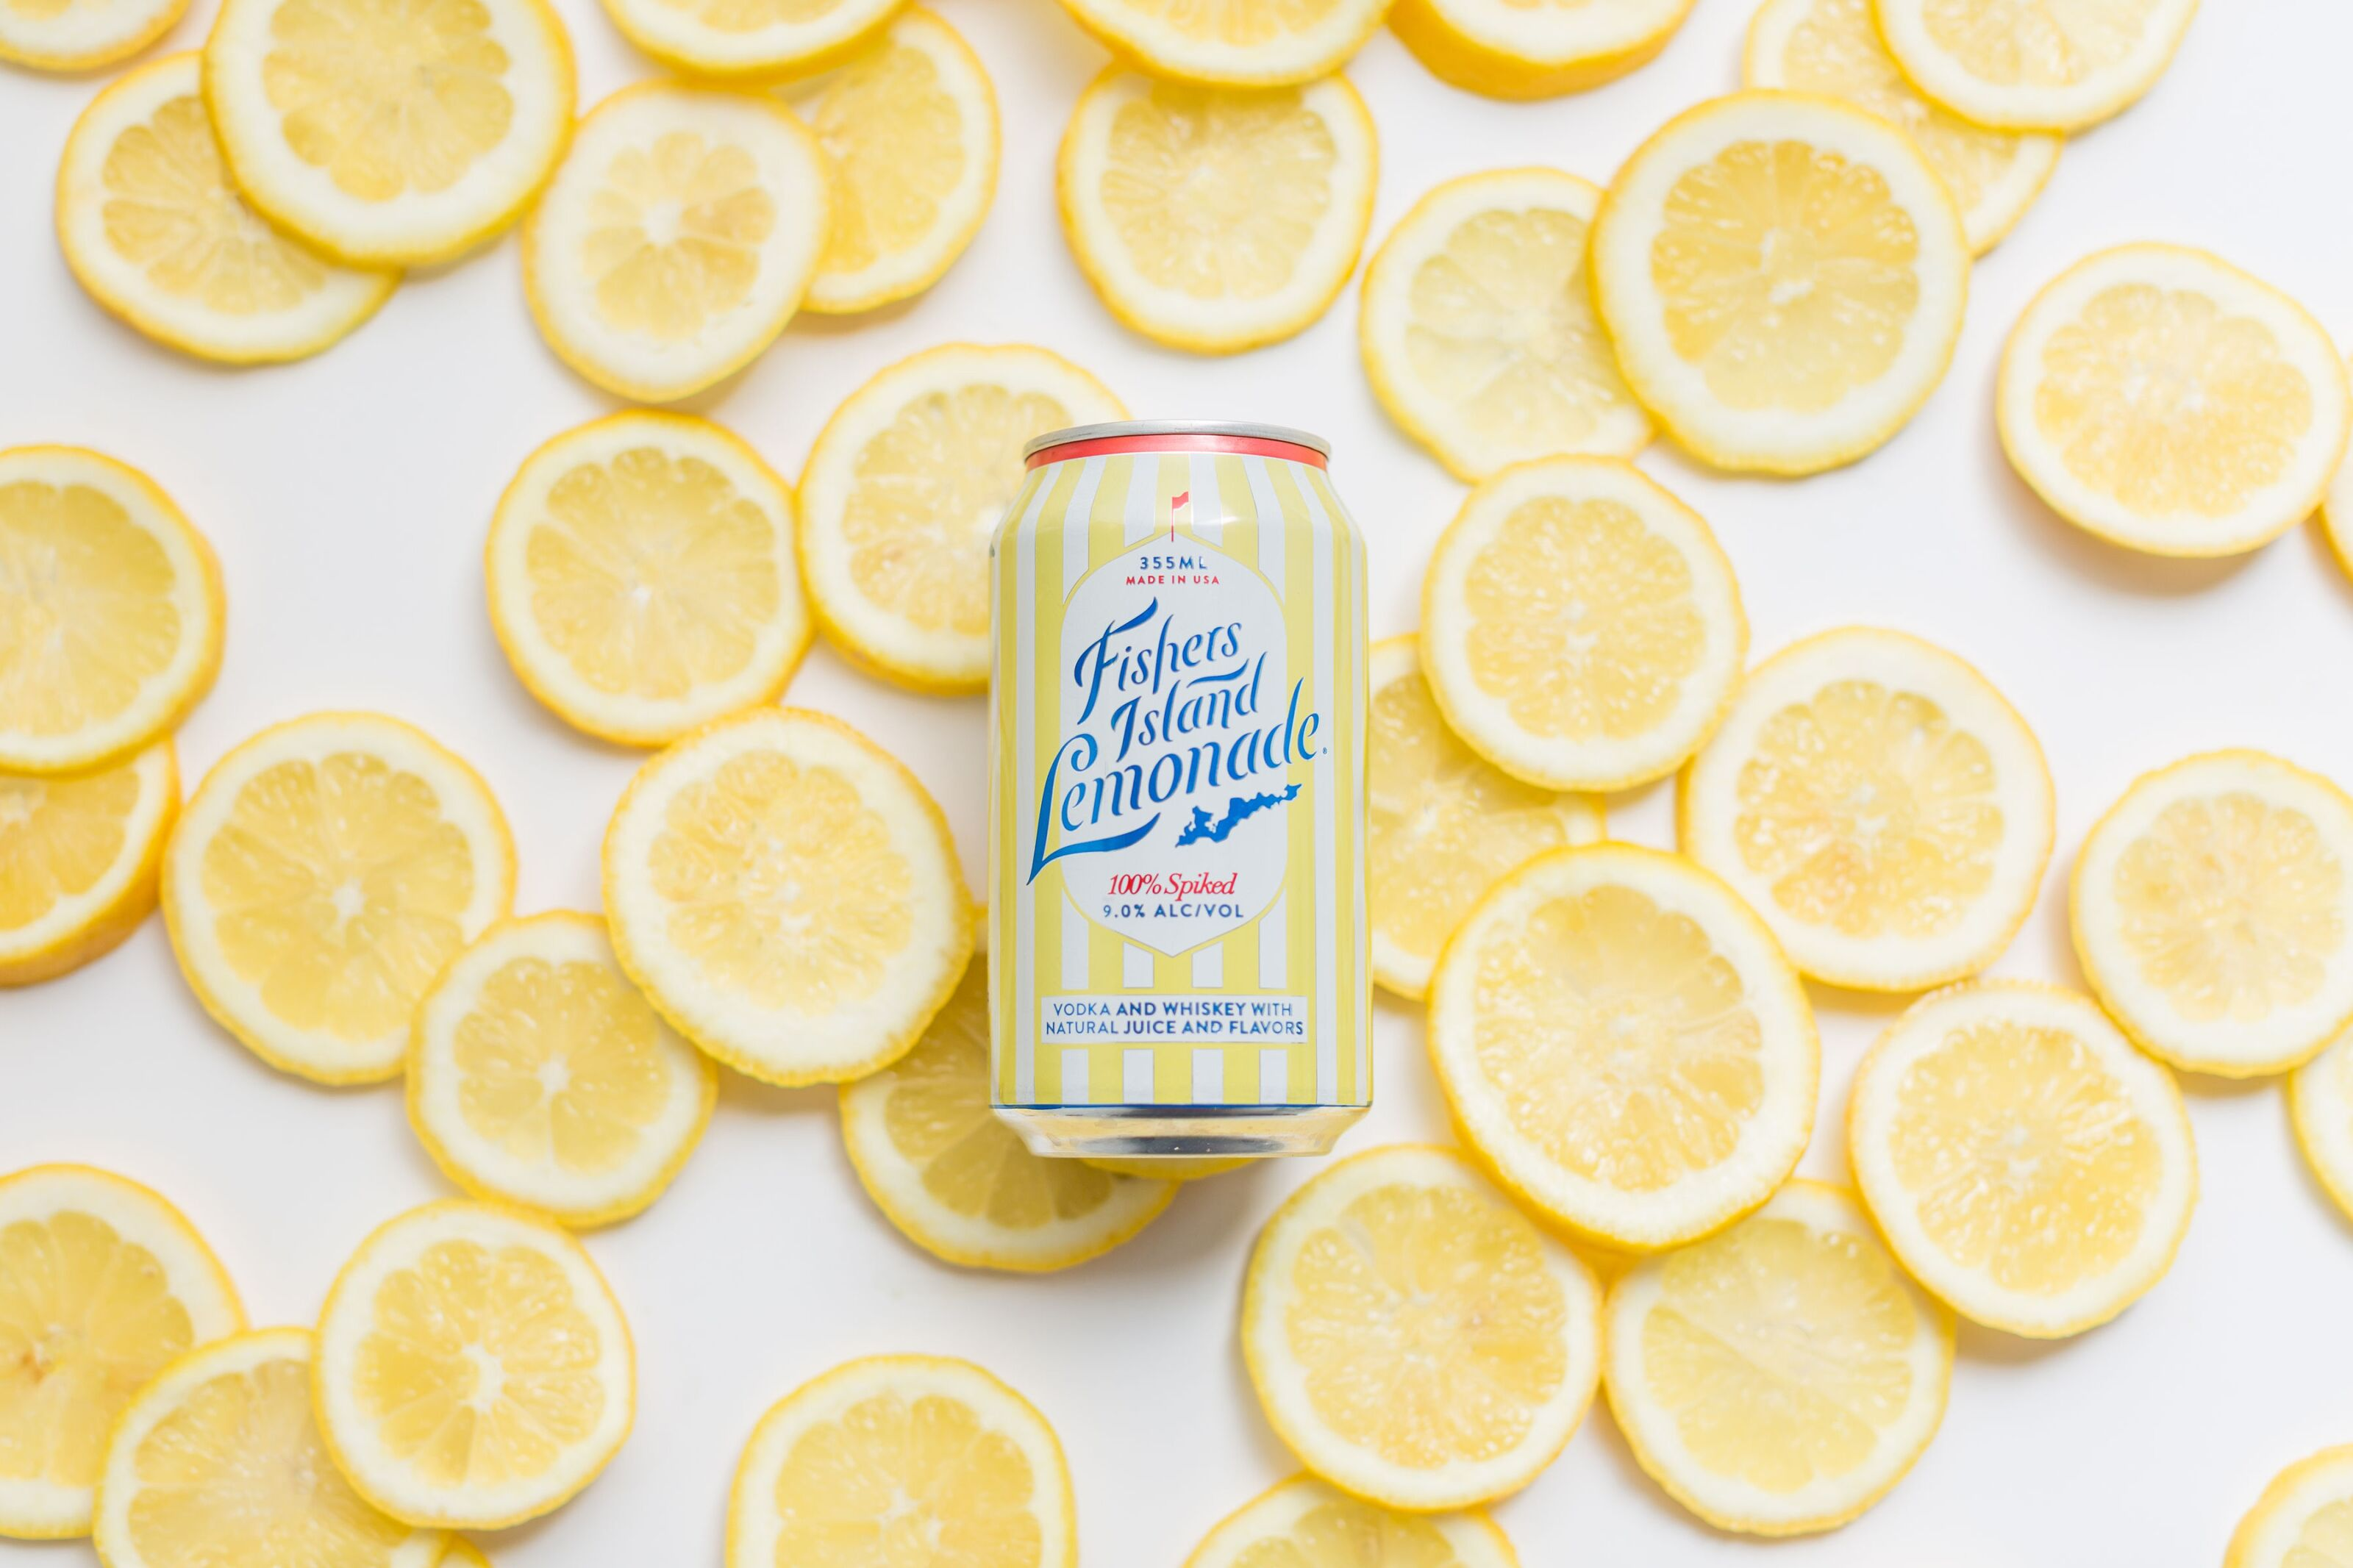 Fishers Island Lemonade is hard lemonade for summer and winter